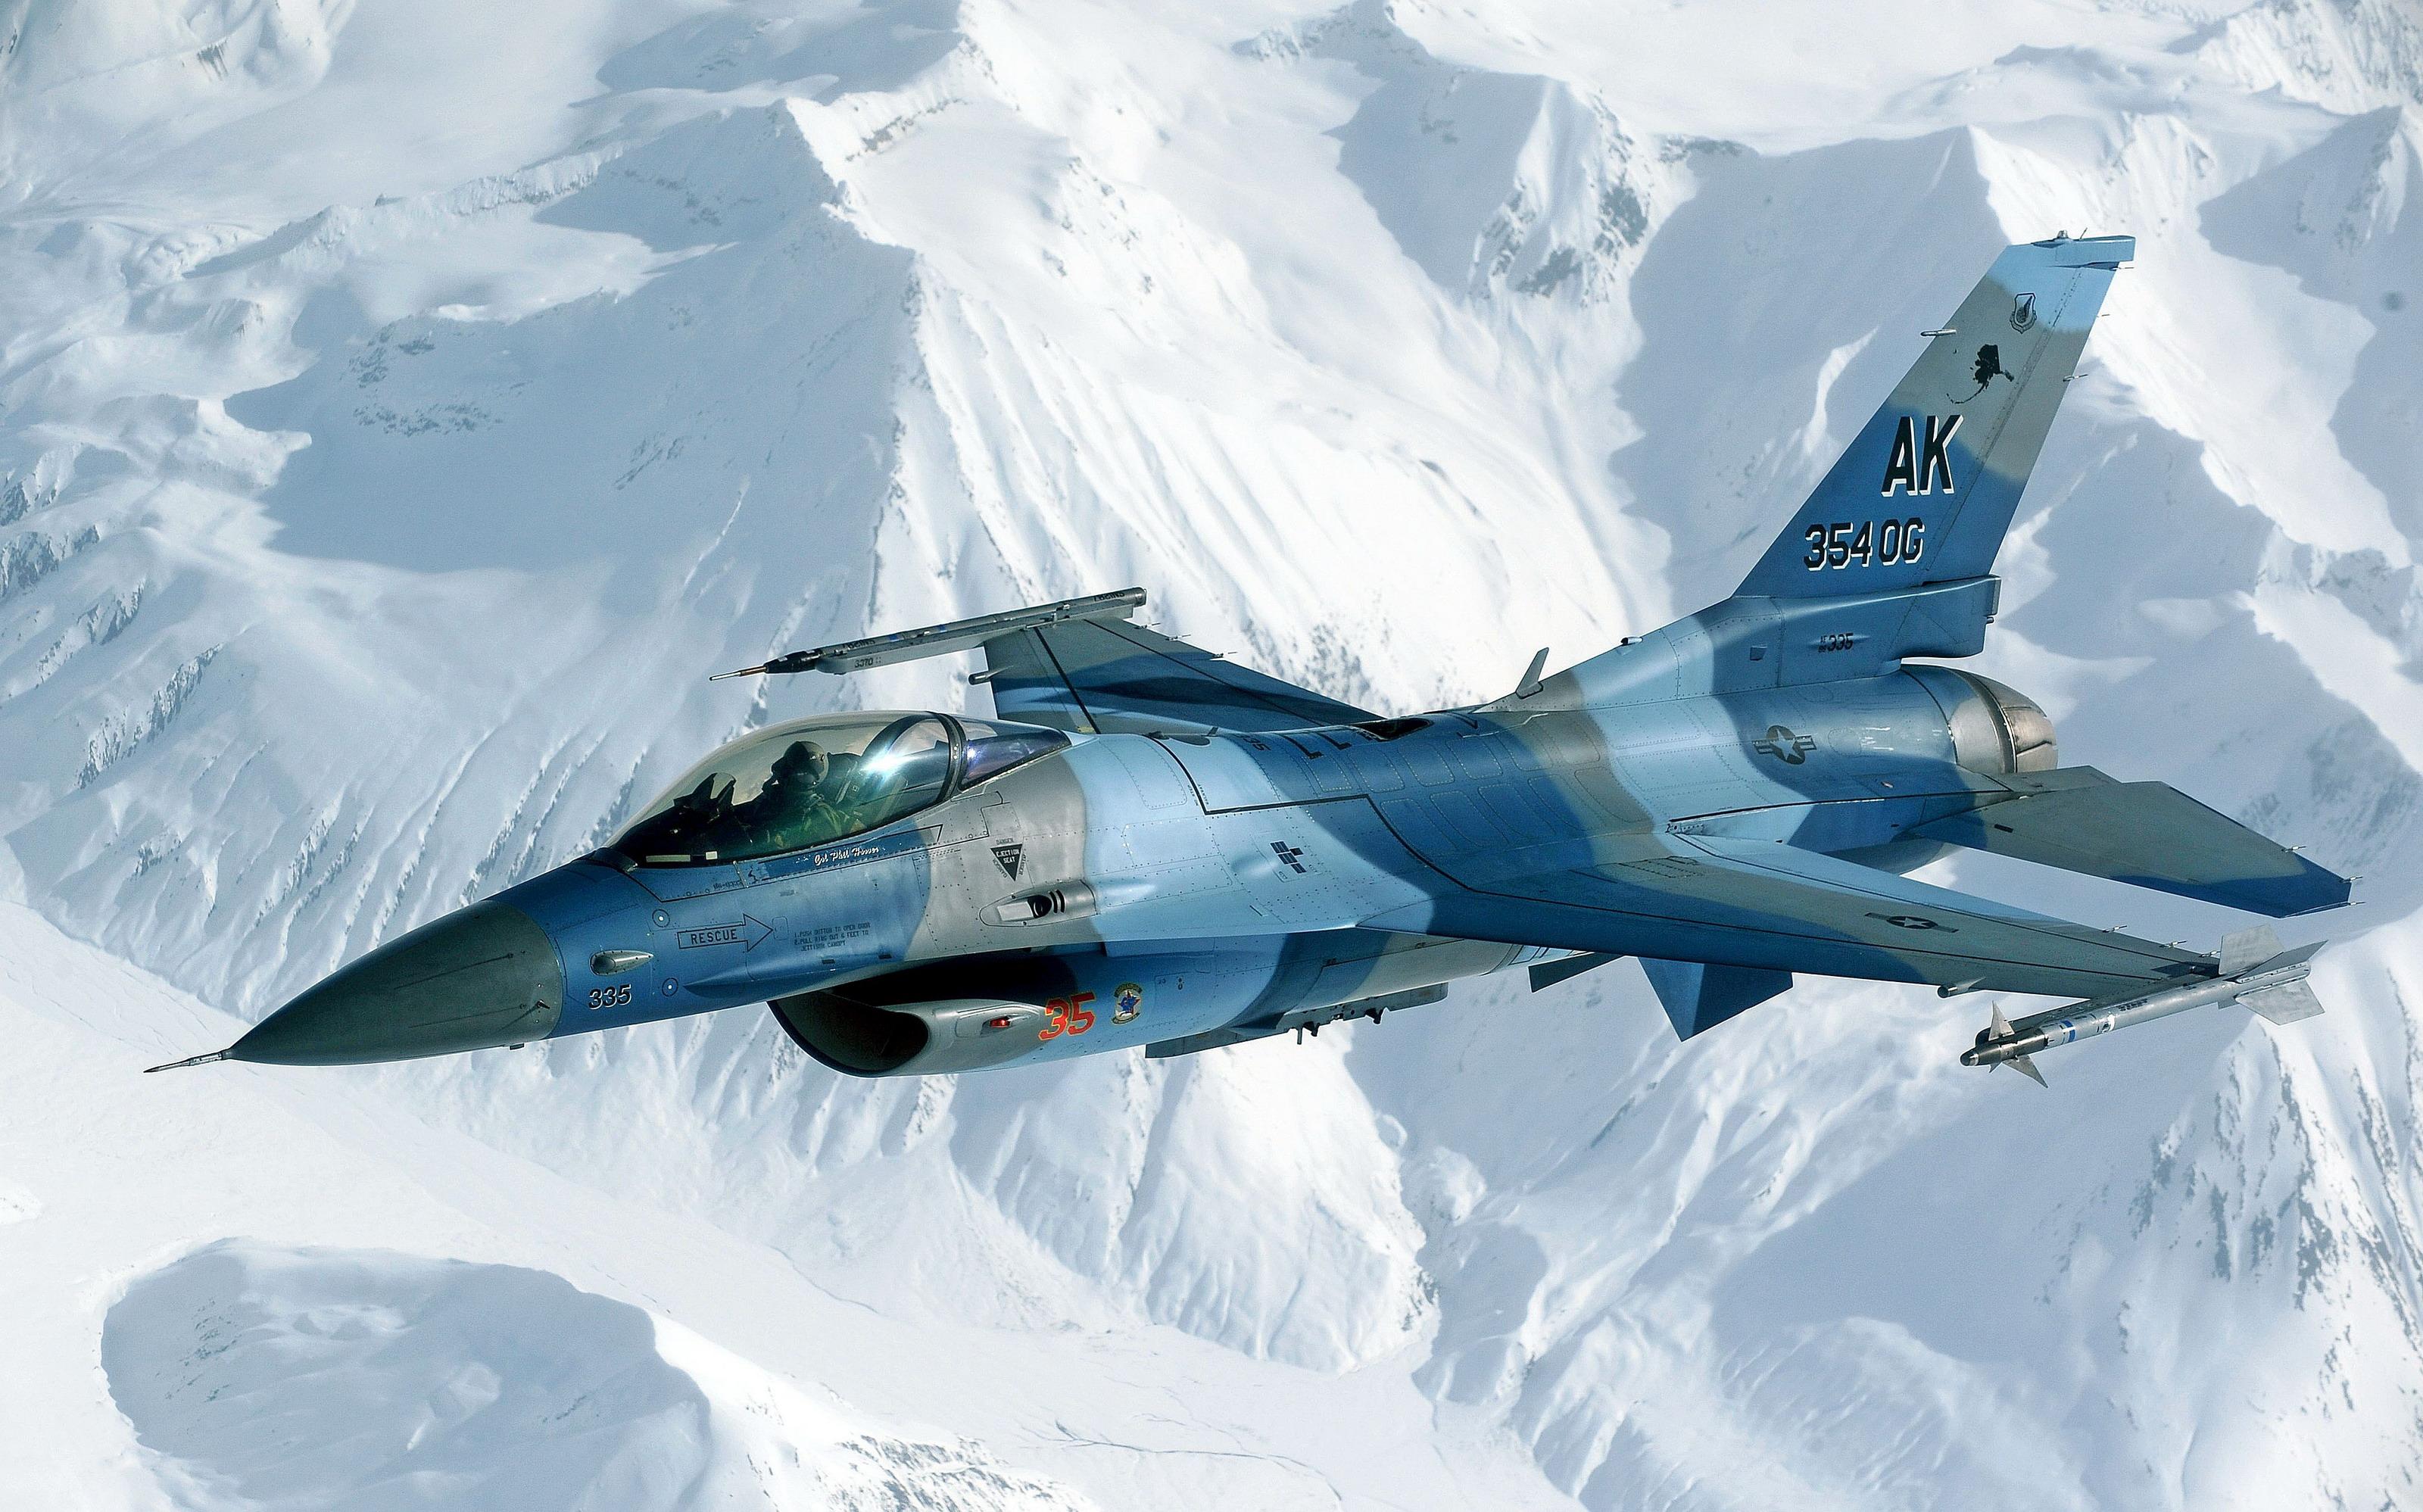 General Dynamics F 16 Fighting Falcon Hd Wallpaper: 143 General Dynamics F-16 Fighting Falcon HD Wallpapers